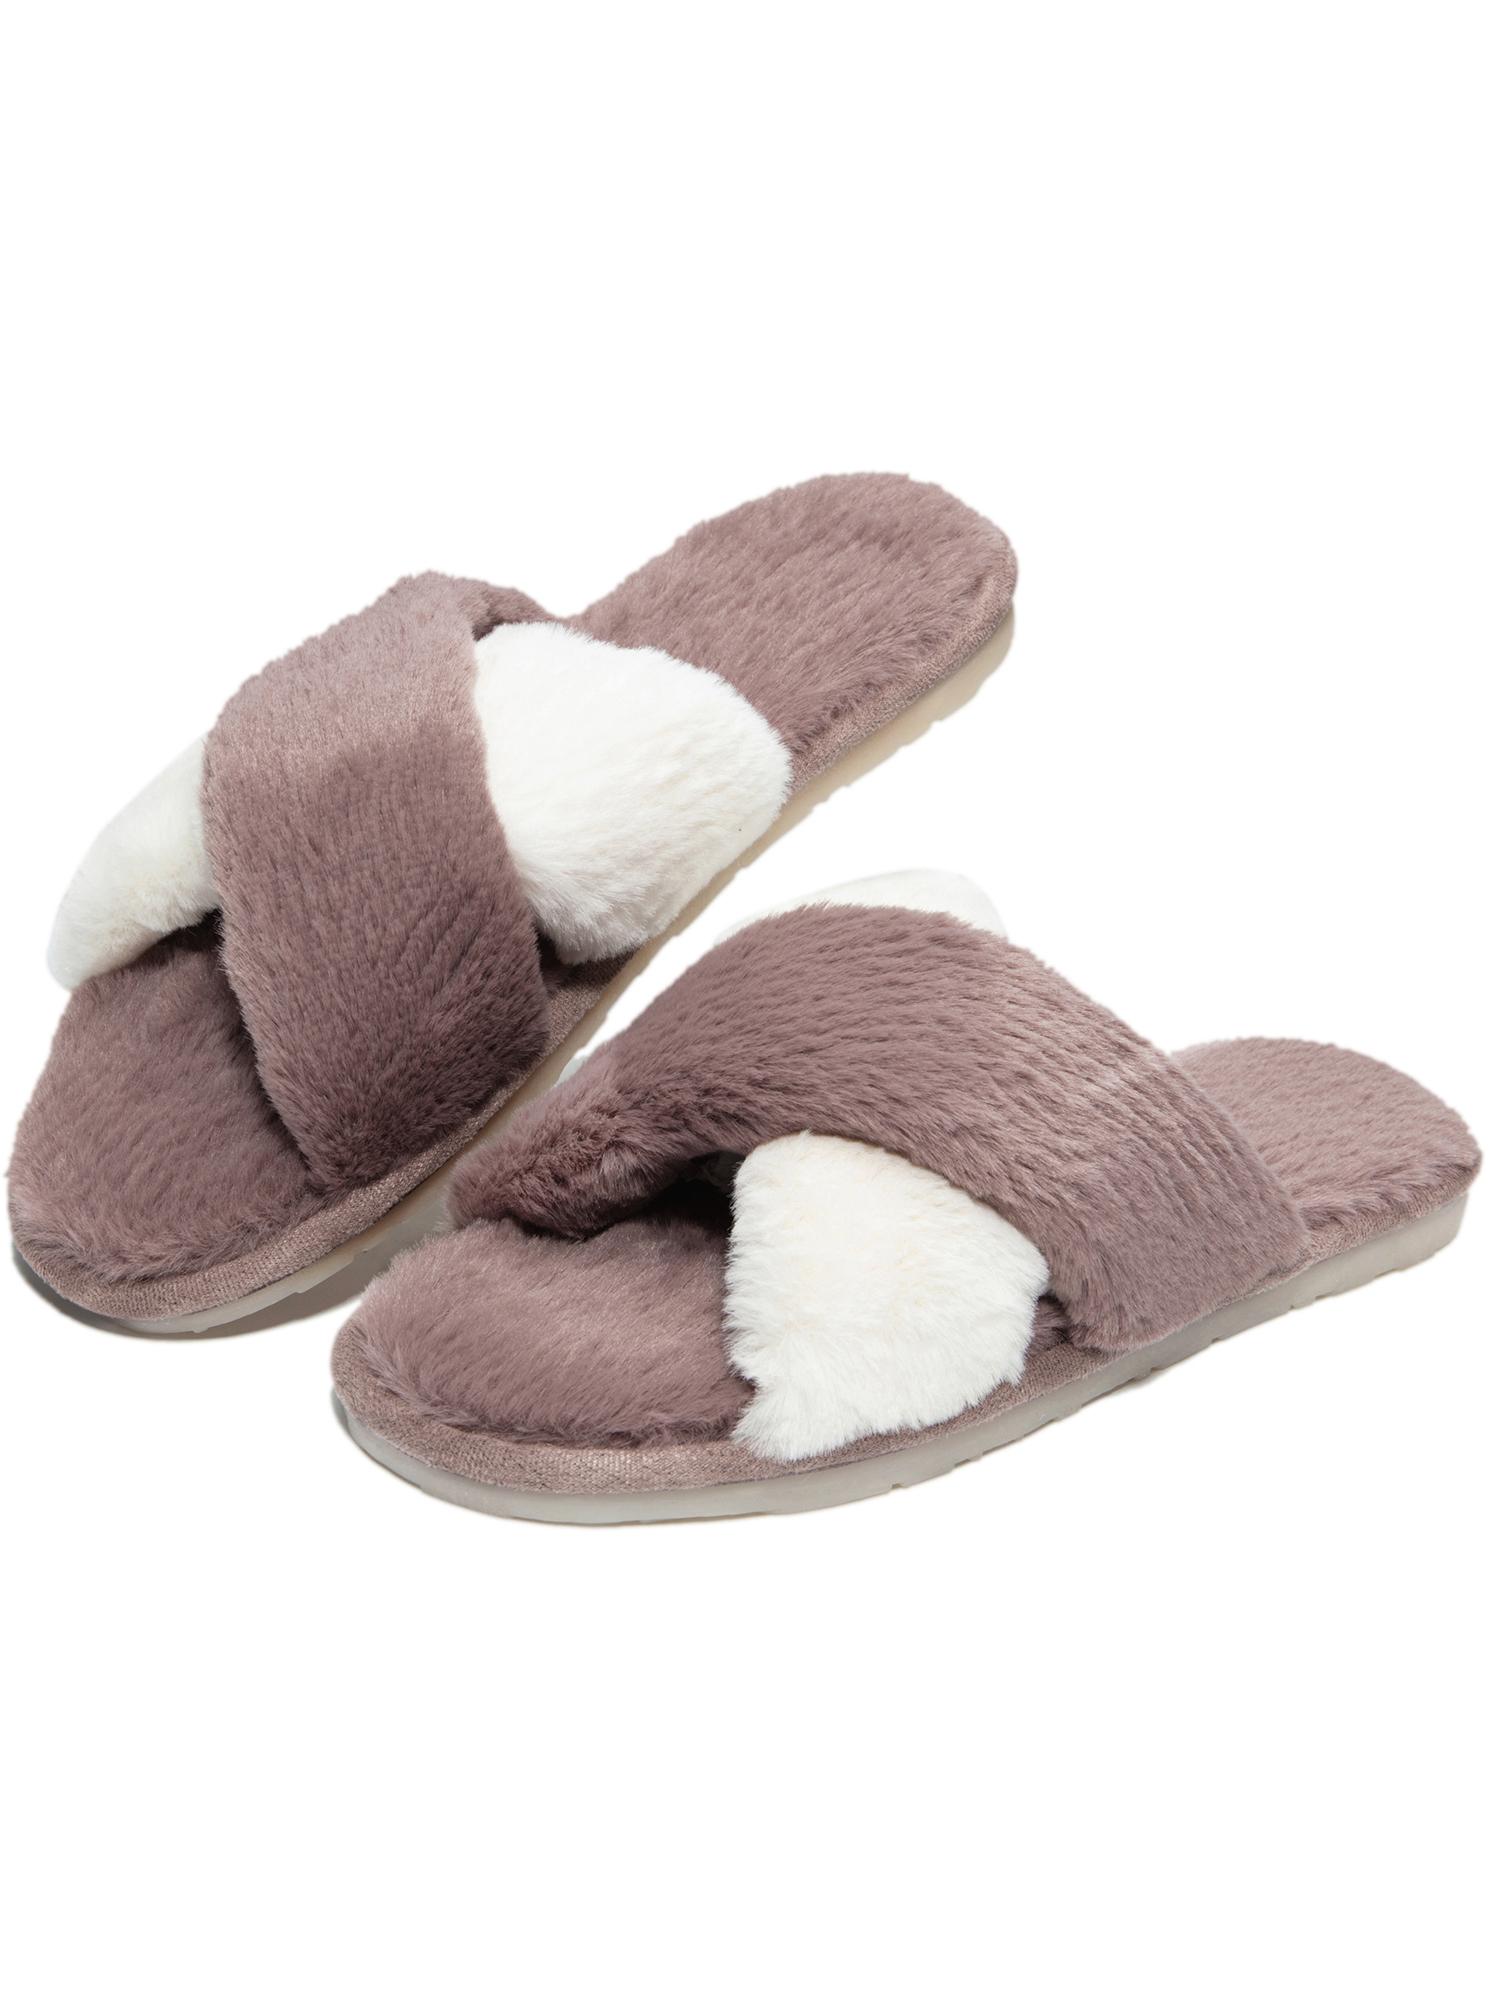 Fur Slippers Winter Autumn Open Toe Raccoon Fur Slides Beach Shoes Gradient Color Women Winter Furry Winter Slippers,Color,9